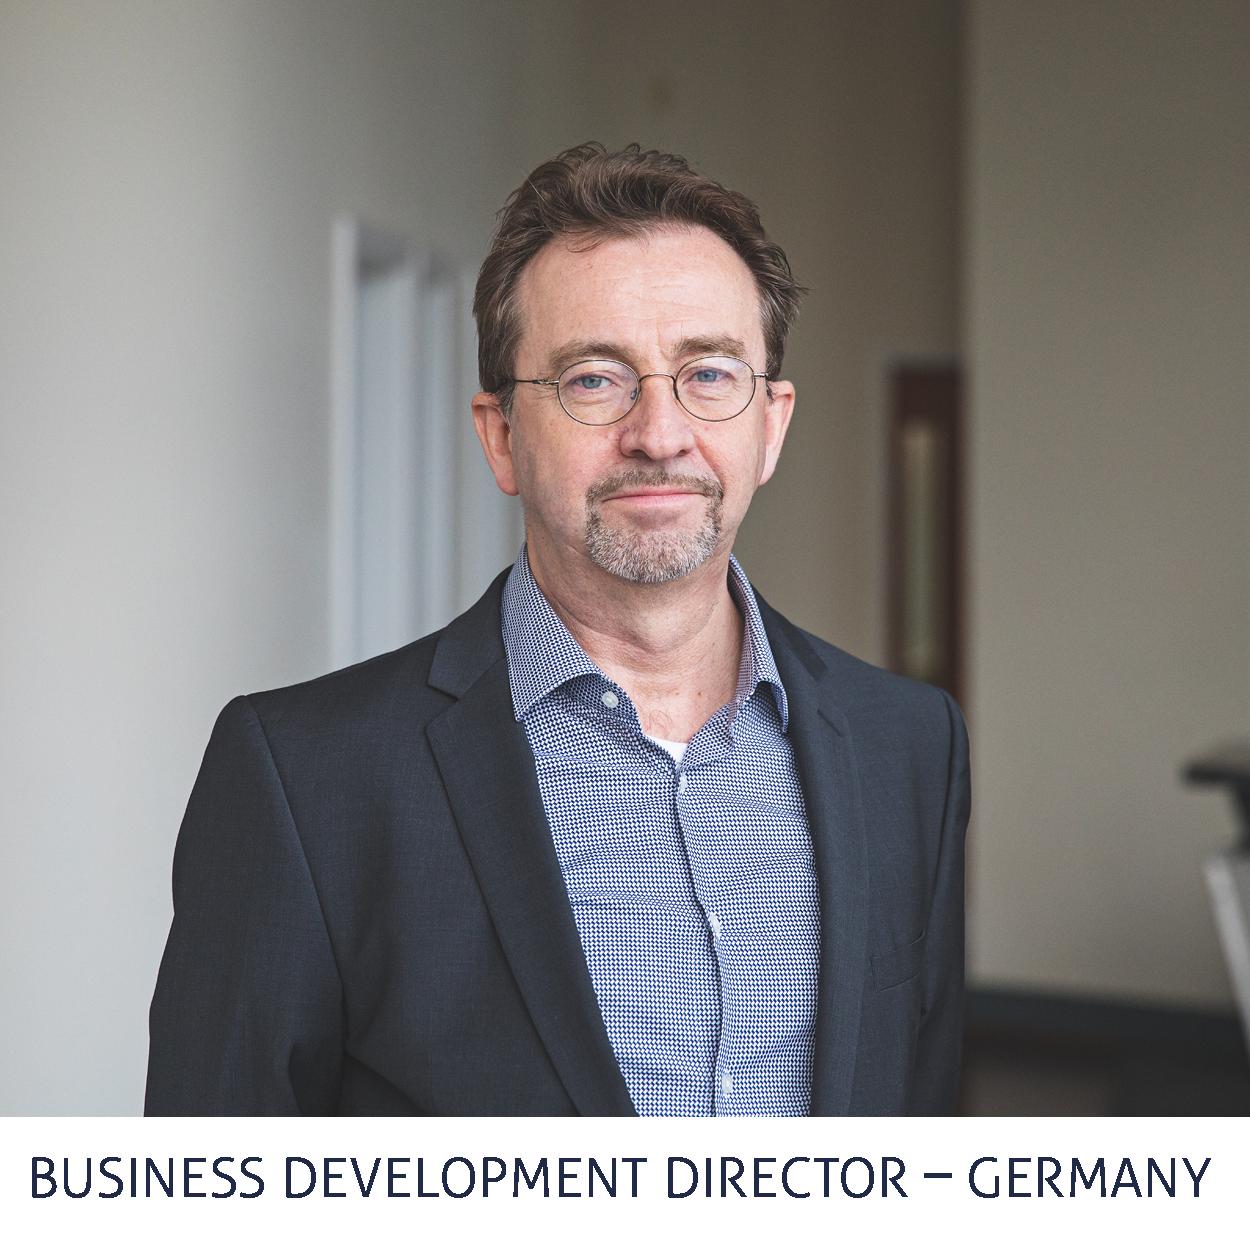 Patrick Cunningham, Business Development Director - Germany